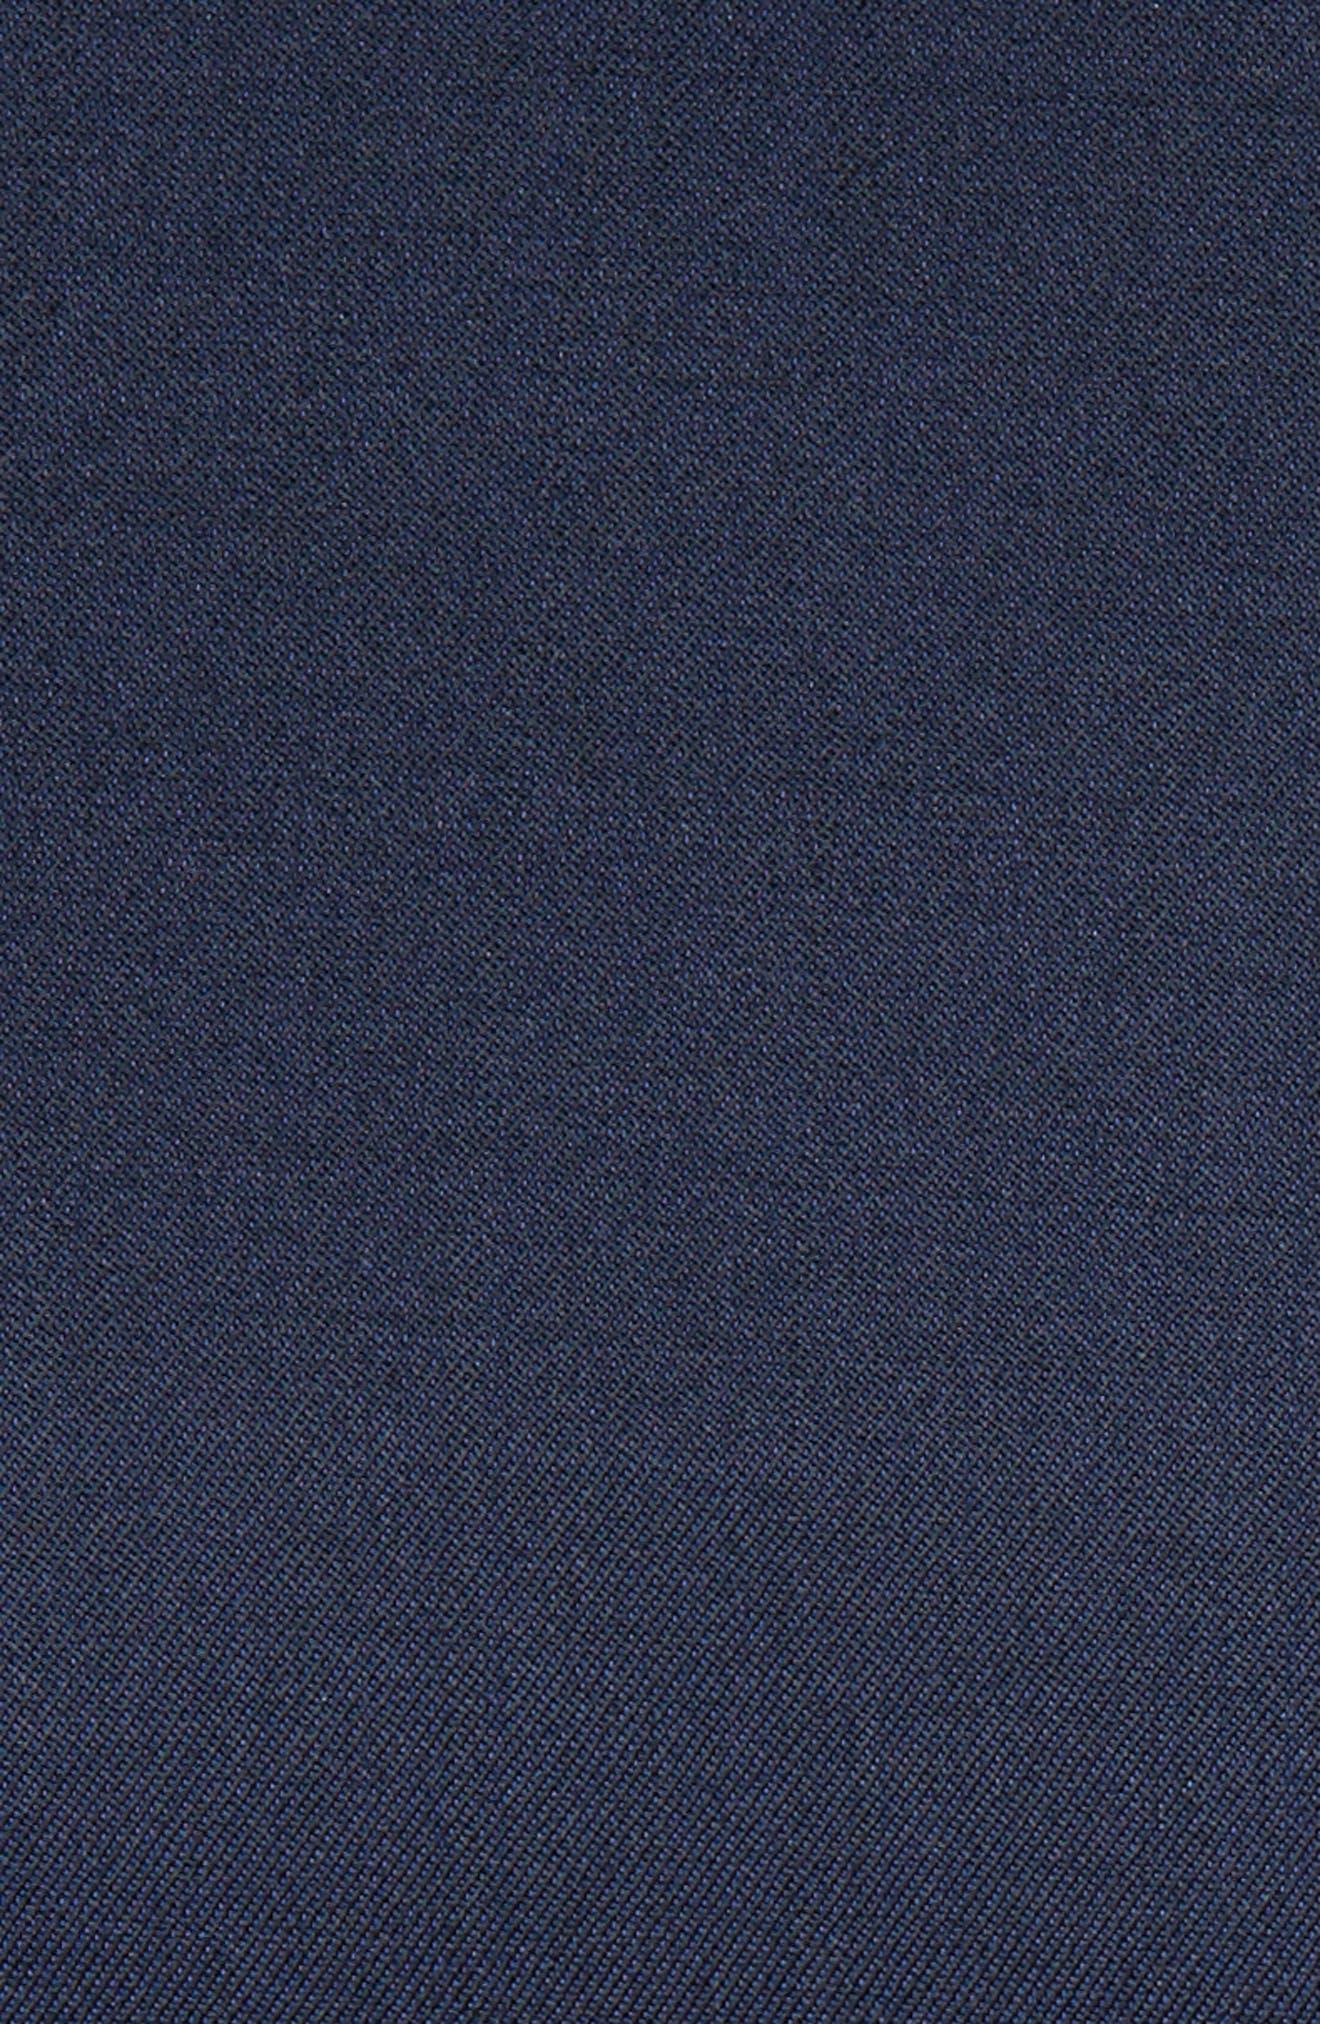 'Josh' Trim Fit Navy Shawl Lapel Tuxedo,                             Alternate thumbnail 4, color,                             NAVY BLUE